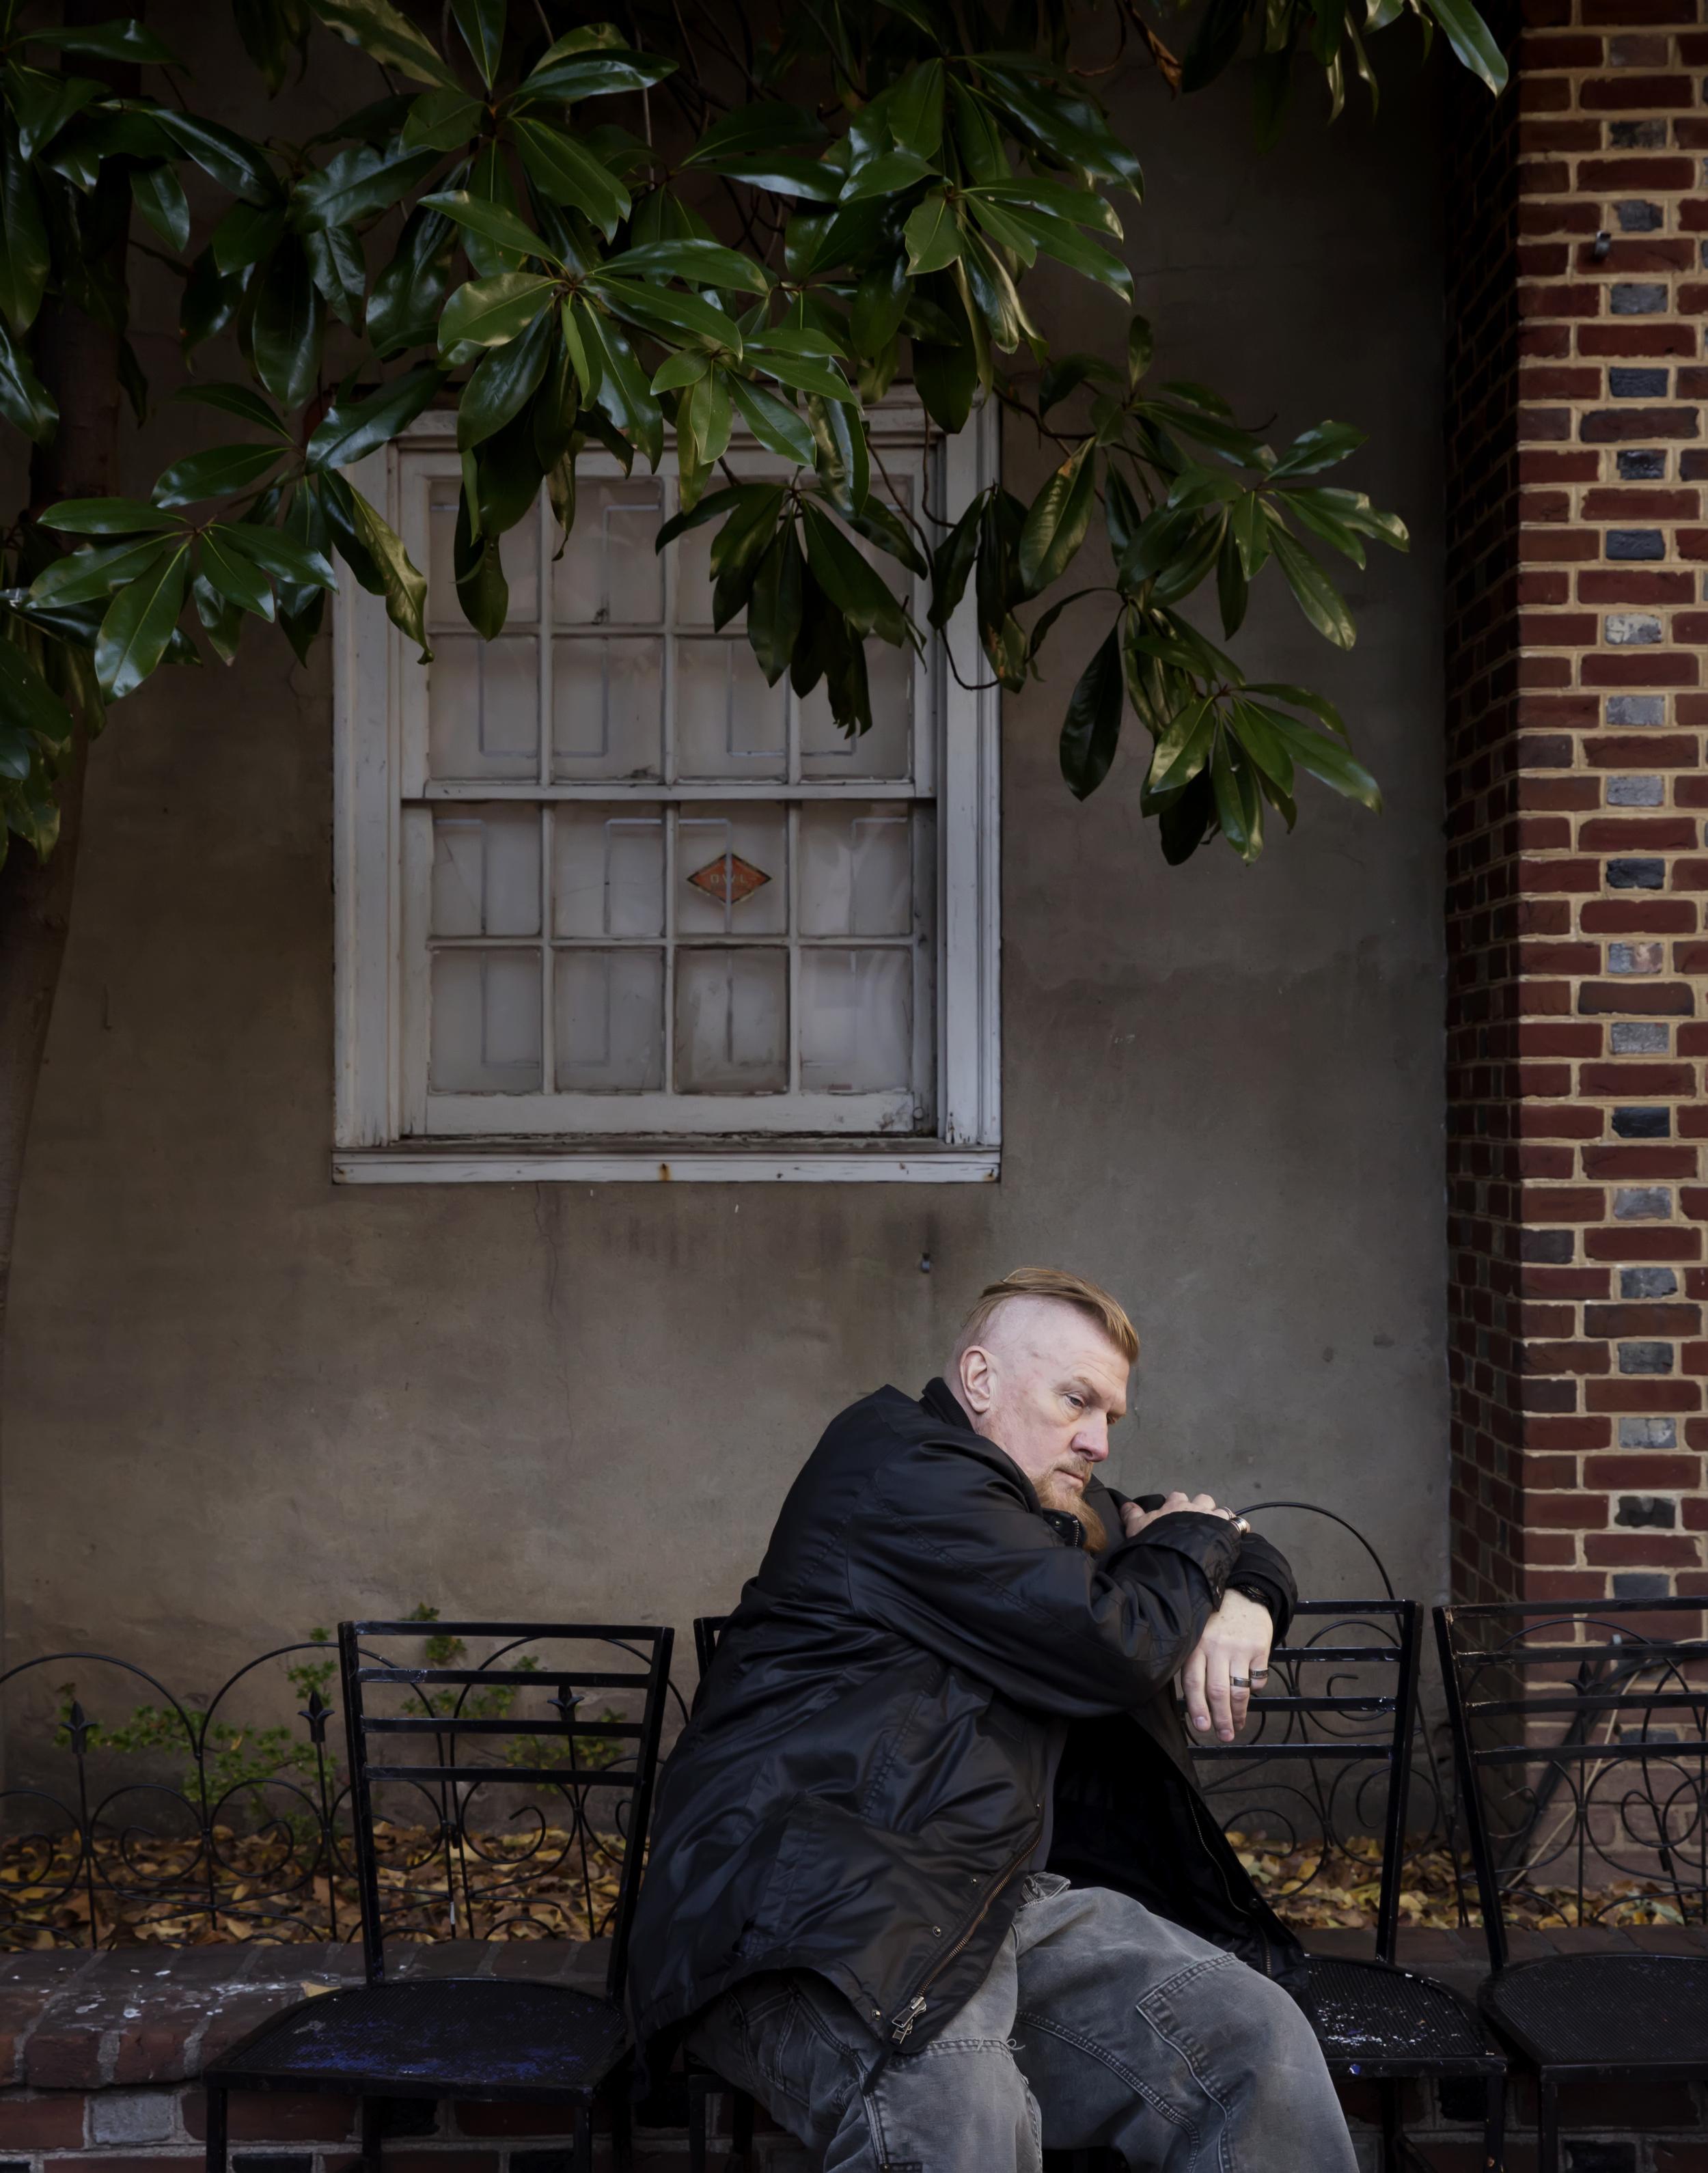 Jimmy, 65. Retired Web Designer and Dog Walker. 14 year survivor of HIV.